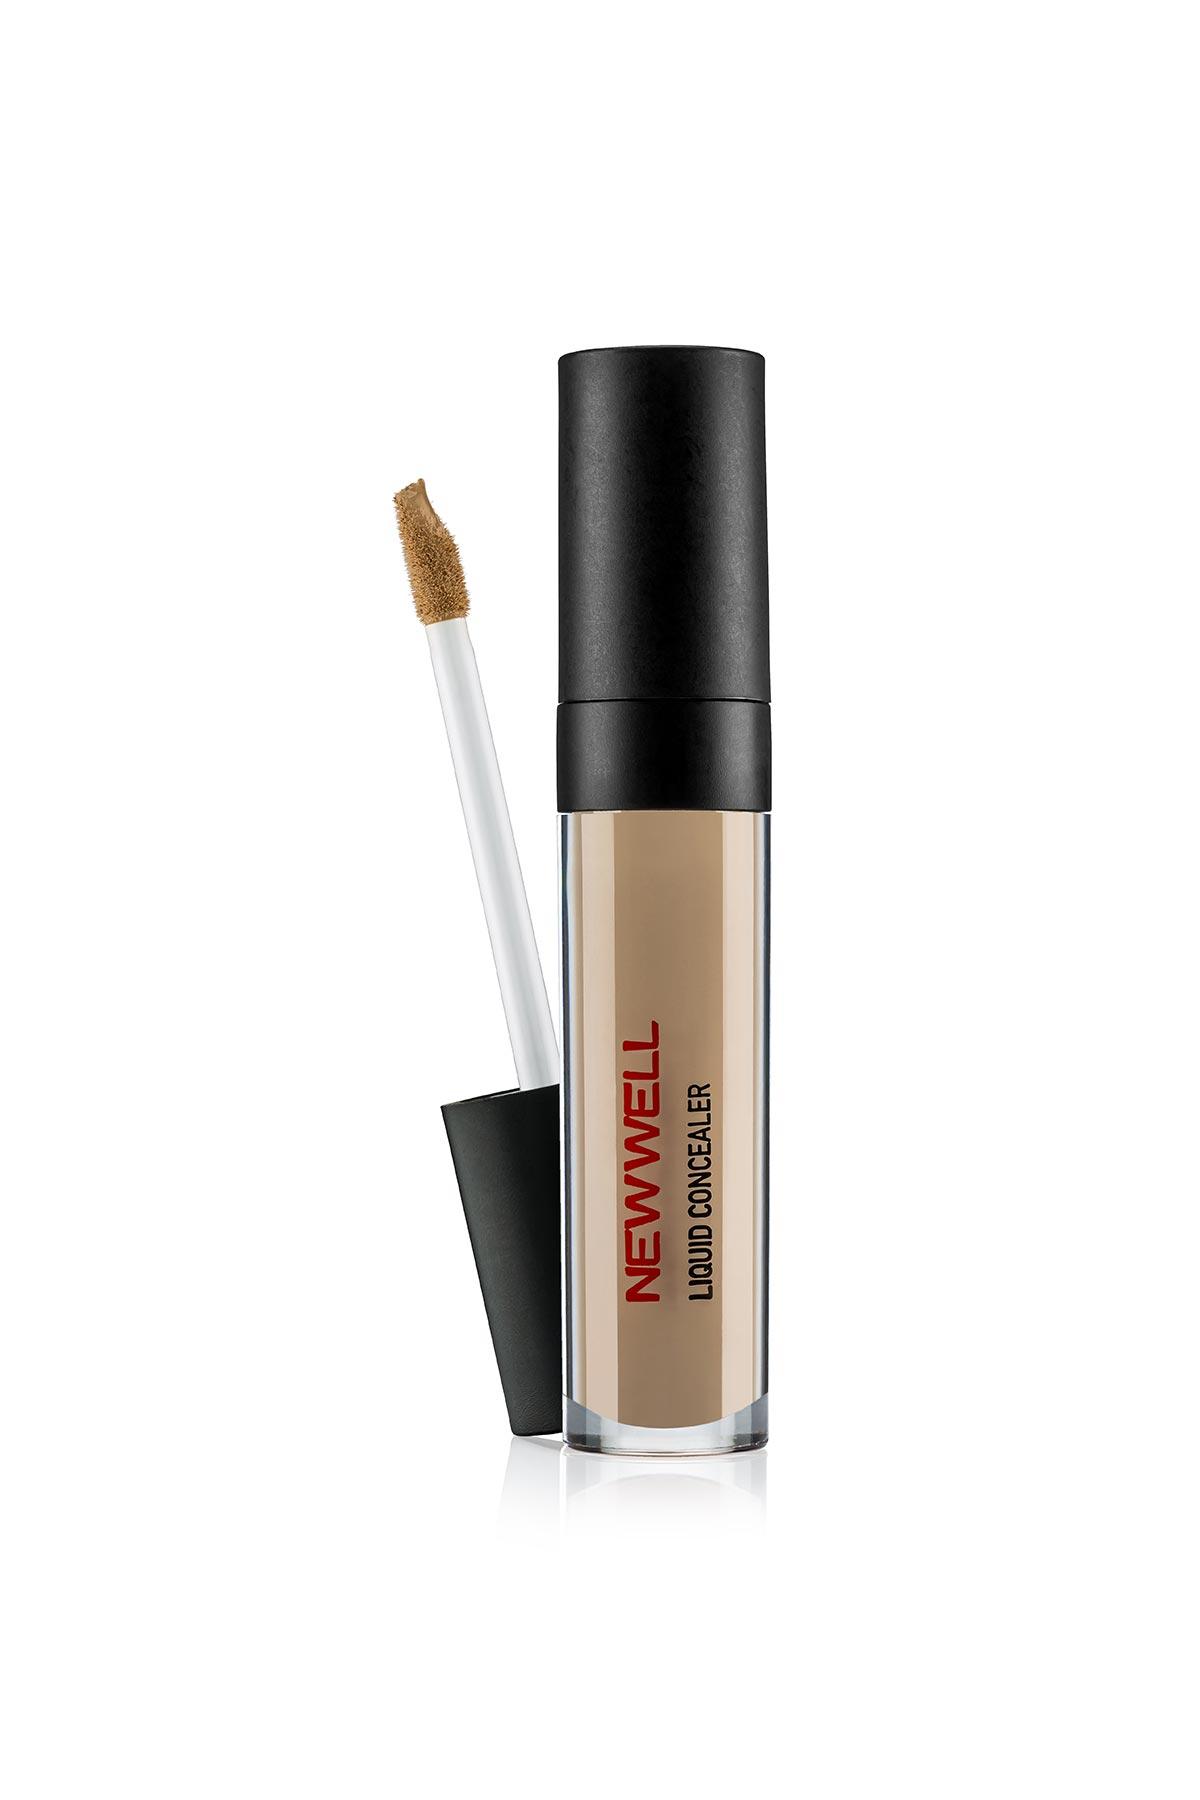 Newwell-Liquid-Concealer-113 Duftzwillinge, Parfum Dupes, Duftzwilling, Parfum Dupe, Duftalternative, Parfumzwillinge, Parfum liste, Duftzwillinge Liste